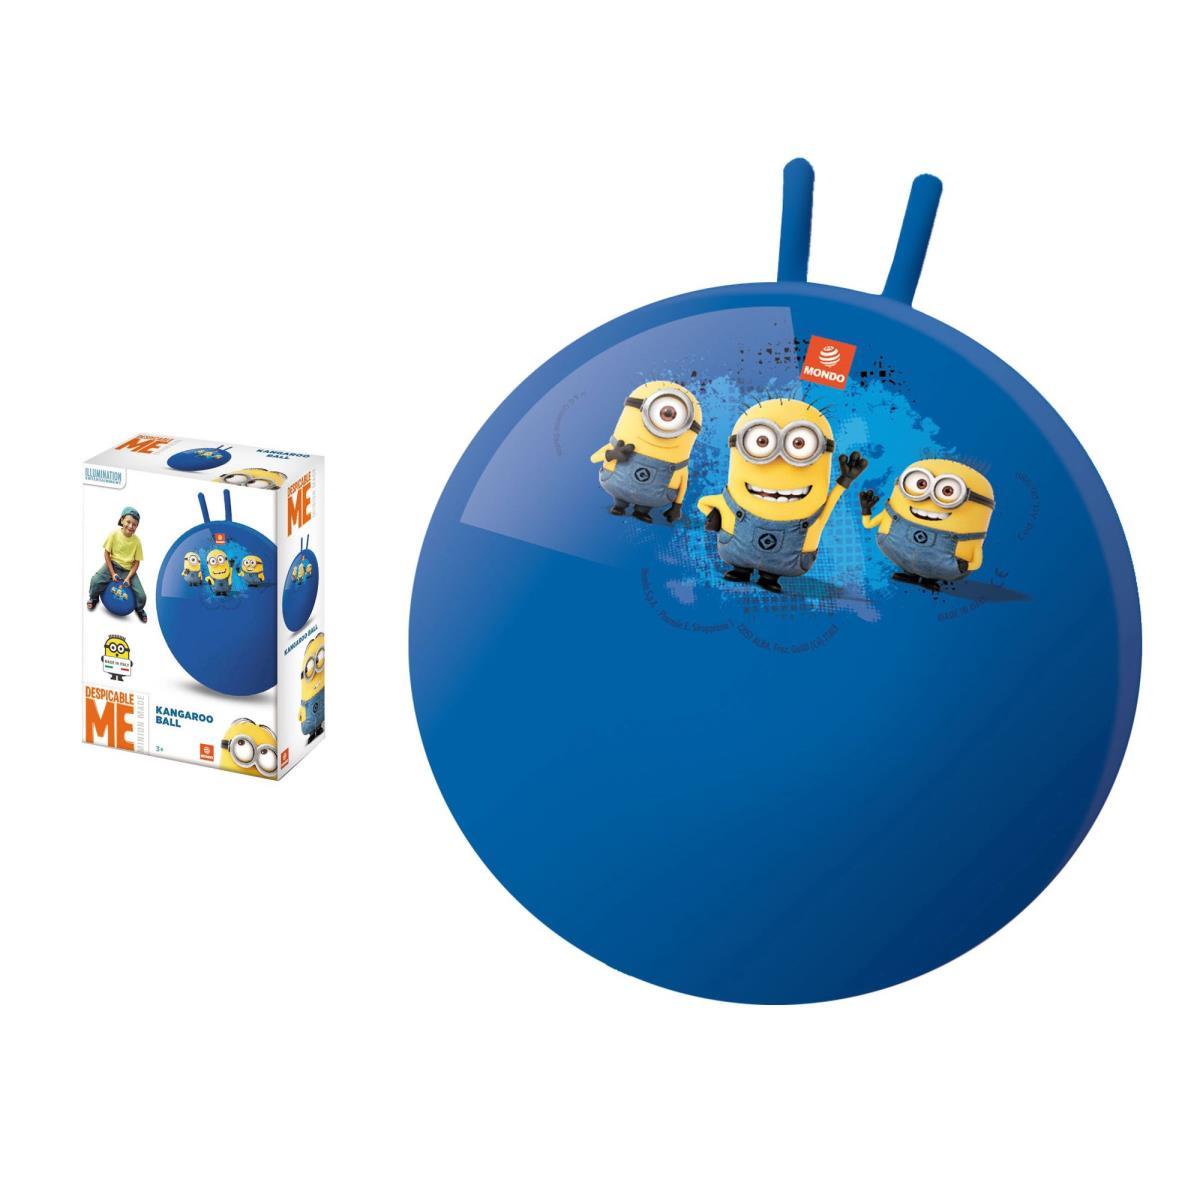 Hüpfball mit Griffen für Kinder Ø 50 cm Sprungball Gymnastikball Springball,Mondo,000051210631, 8001011069897